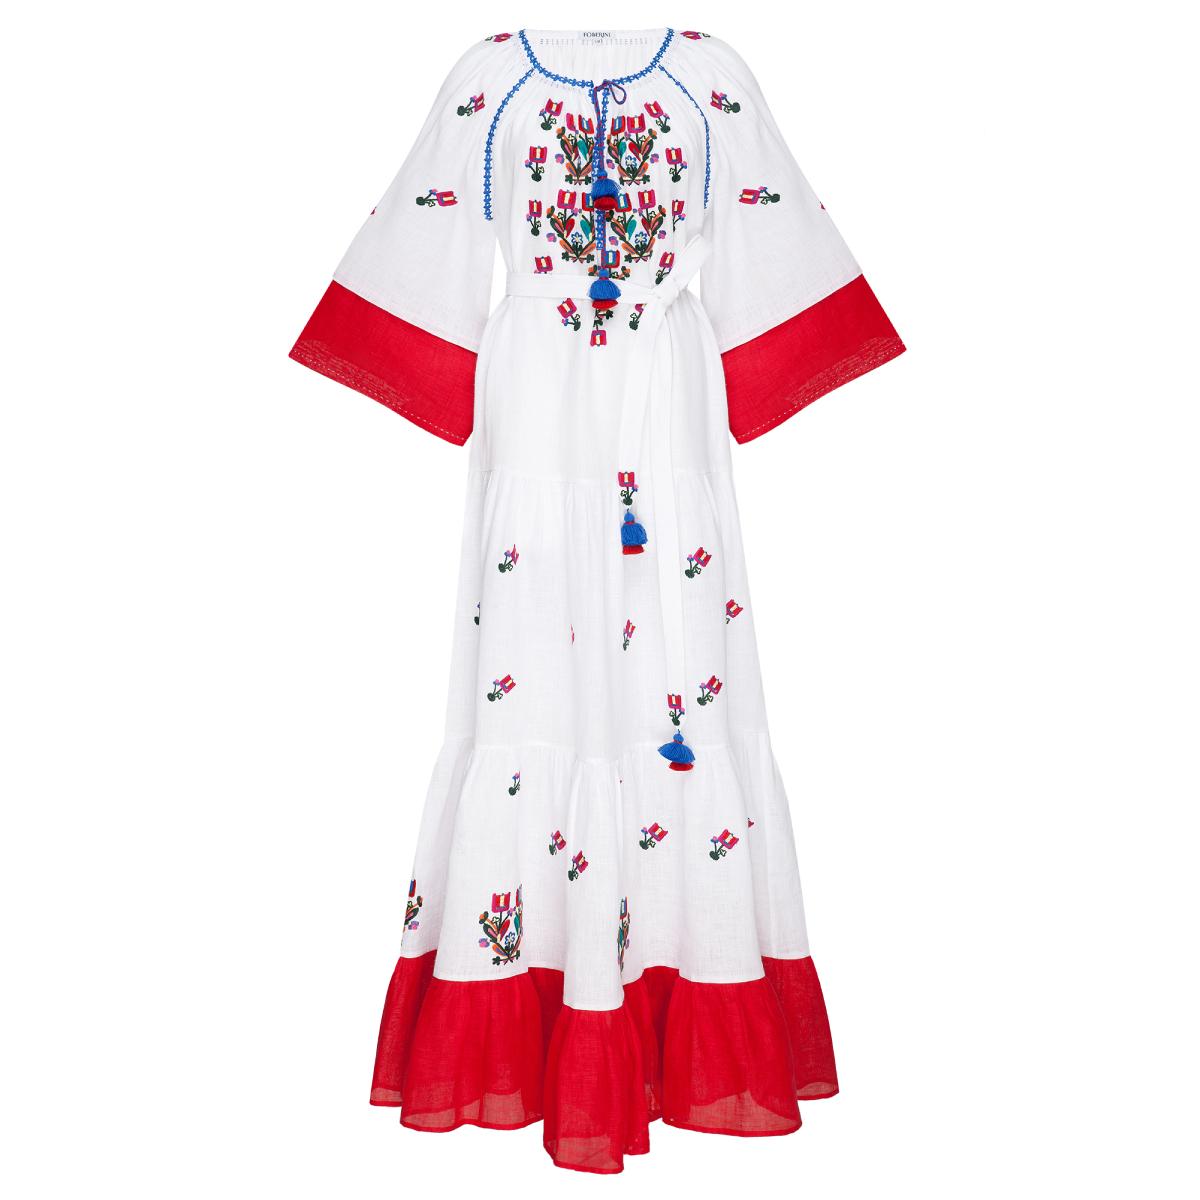 Omelia Chic Dhite Maxi Dress